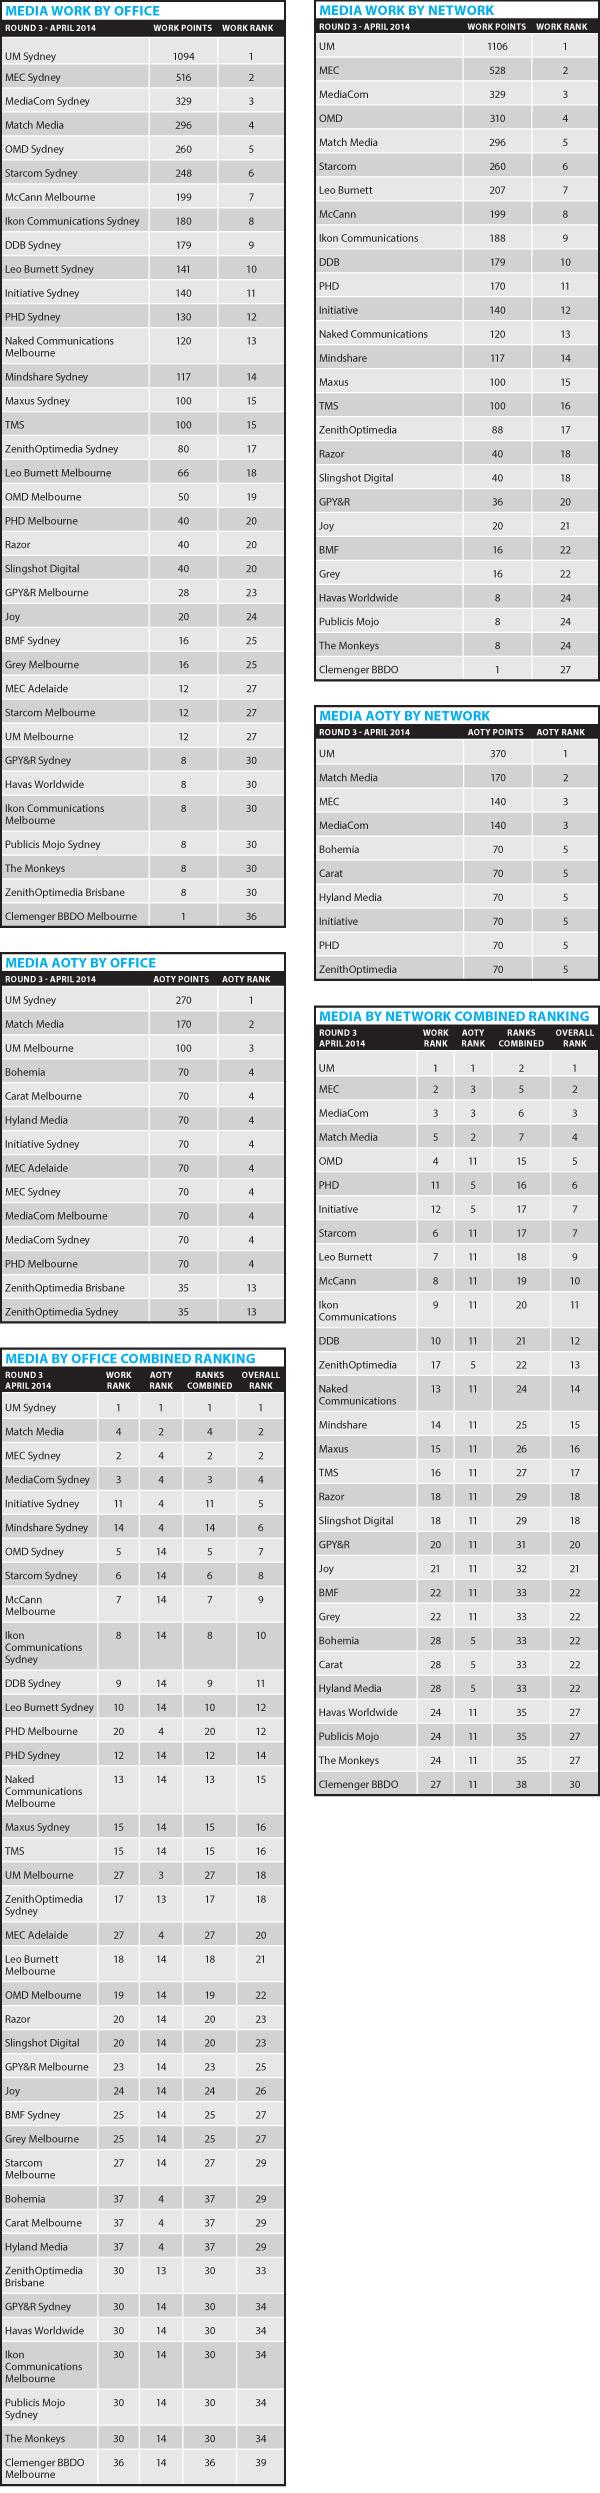 Media Agencies Rankings